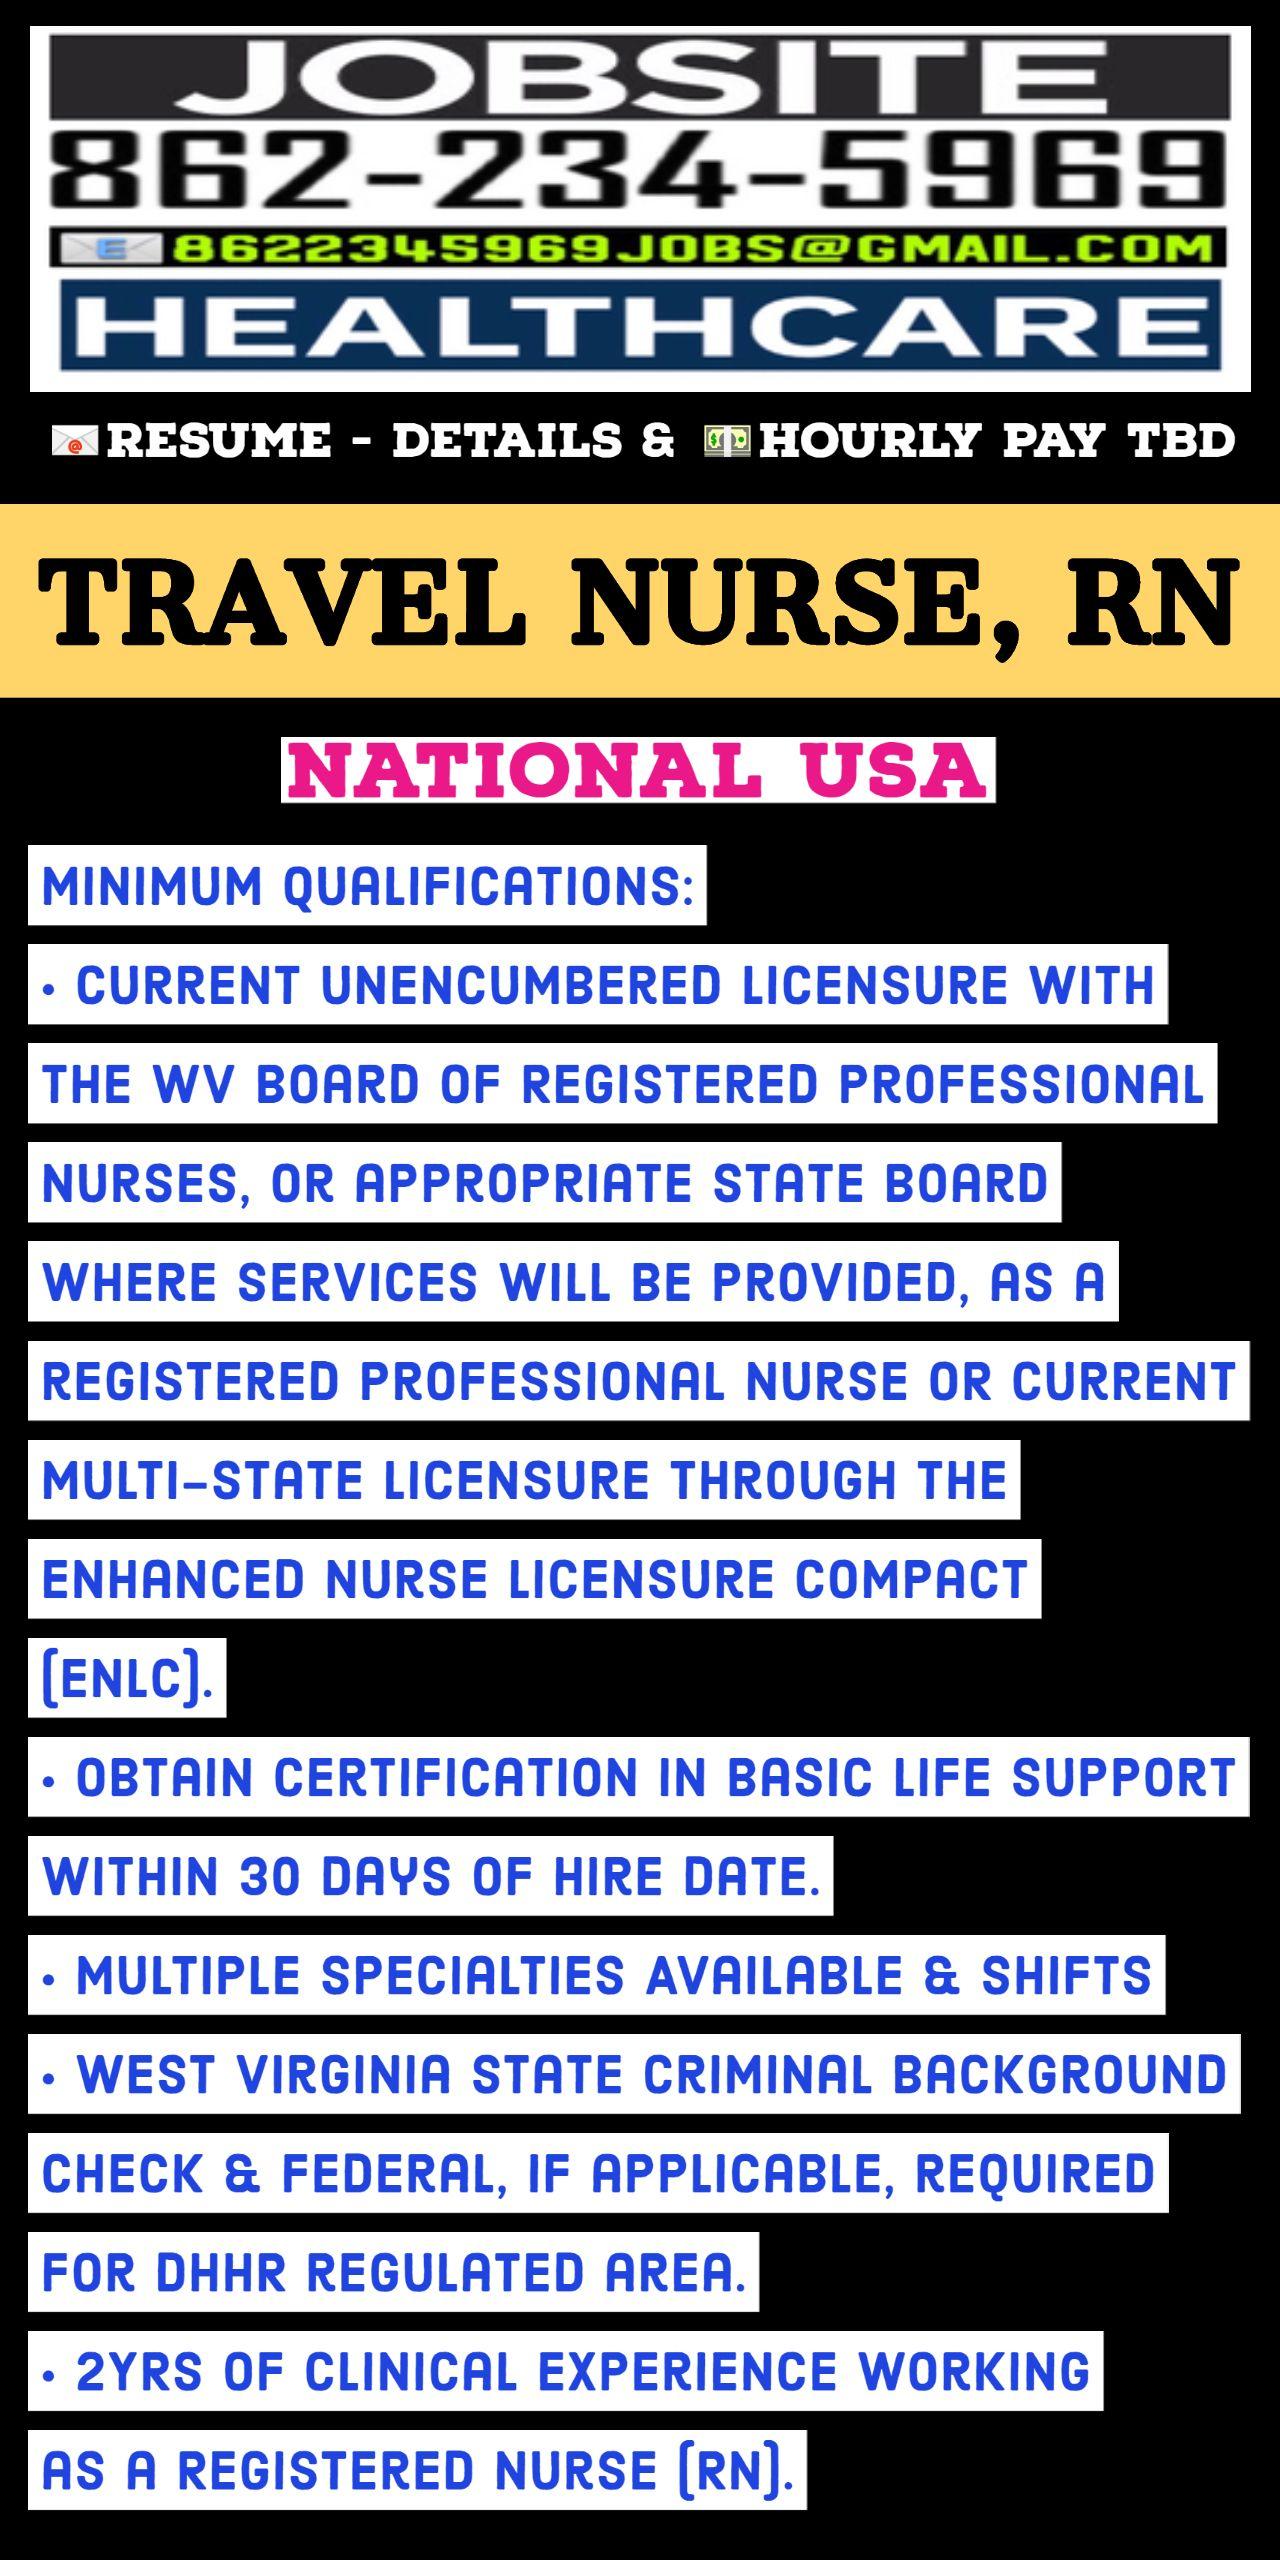 Travel nurse rn